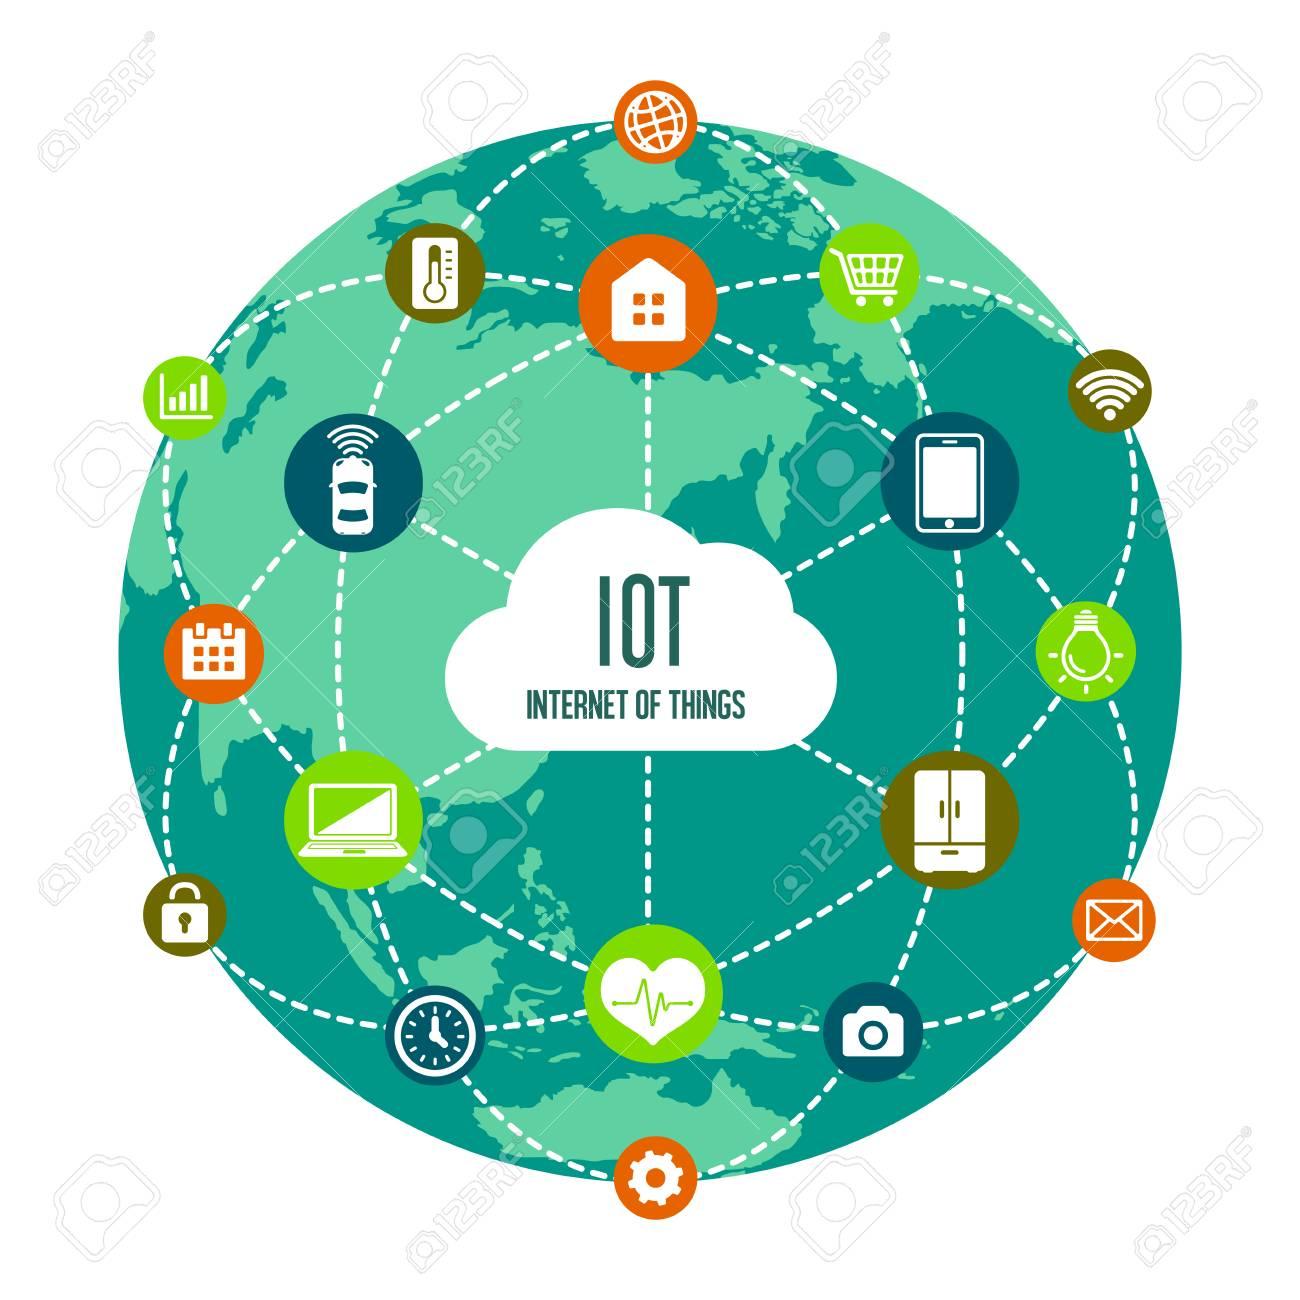 IoT (internet of things) image illustration - 92572795